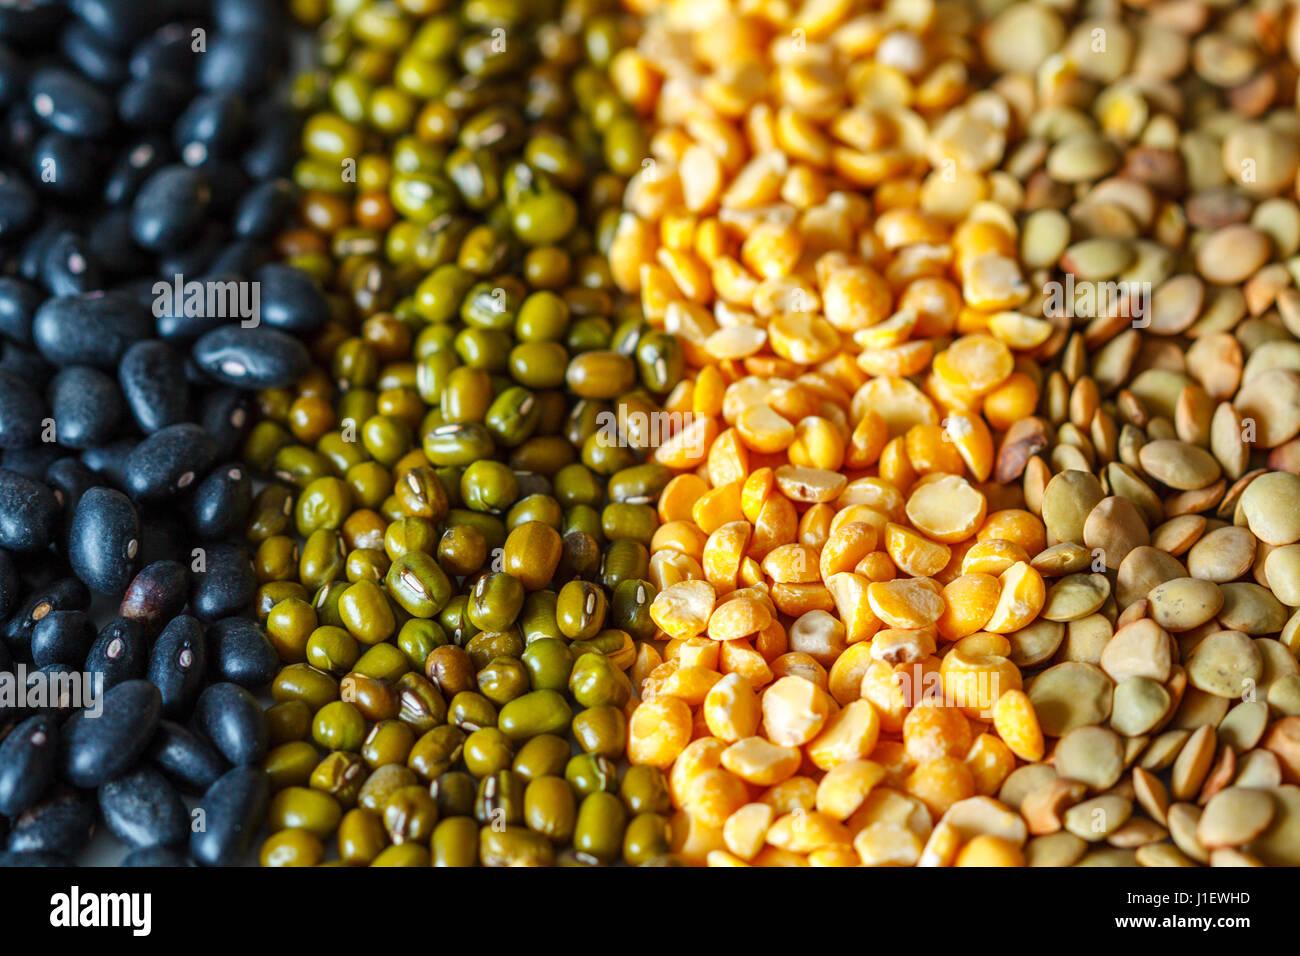 Antecedentes: cereales, guisantes, garbanzos, lentejas, frijoles negros Imagen De Stock